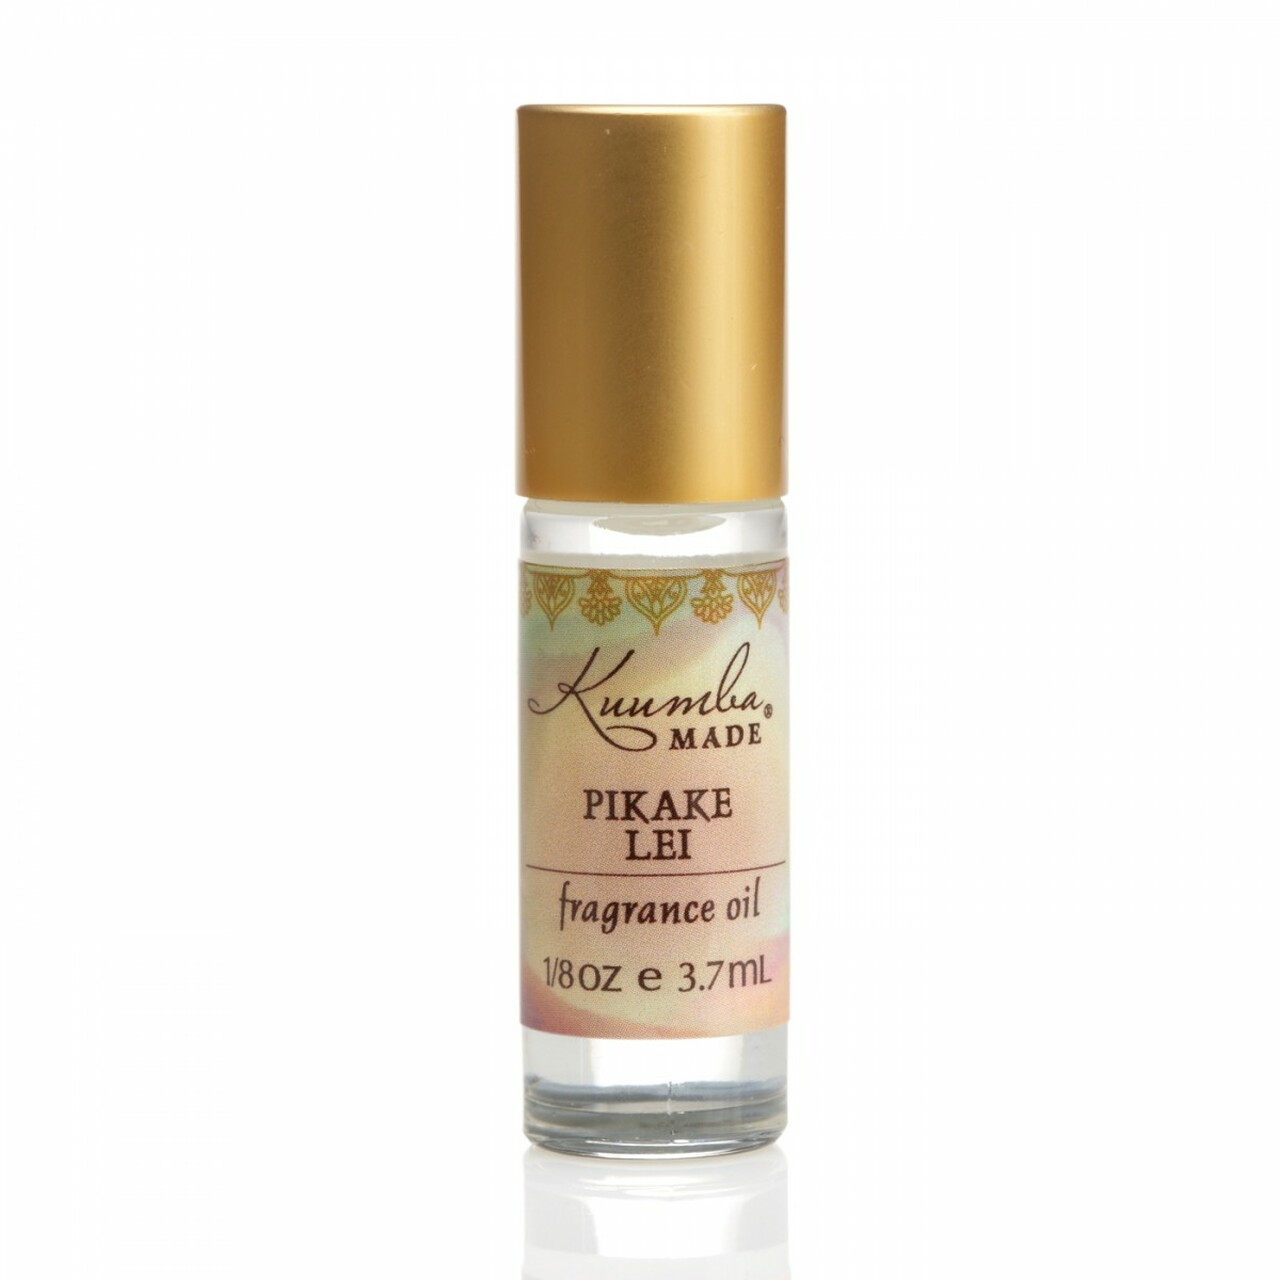 Kuumba Made Pikake Lei Fragrance Oil